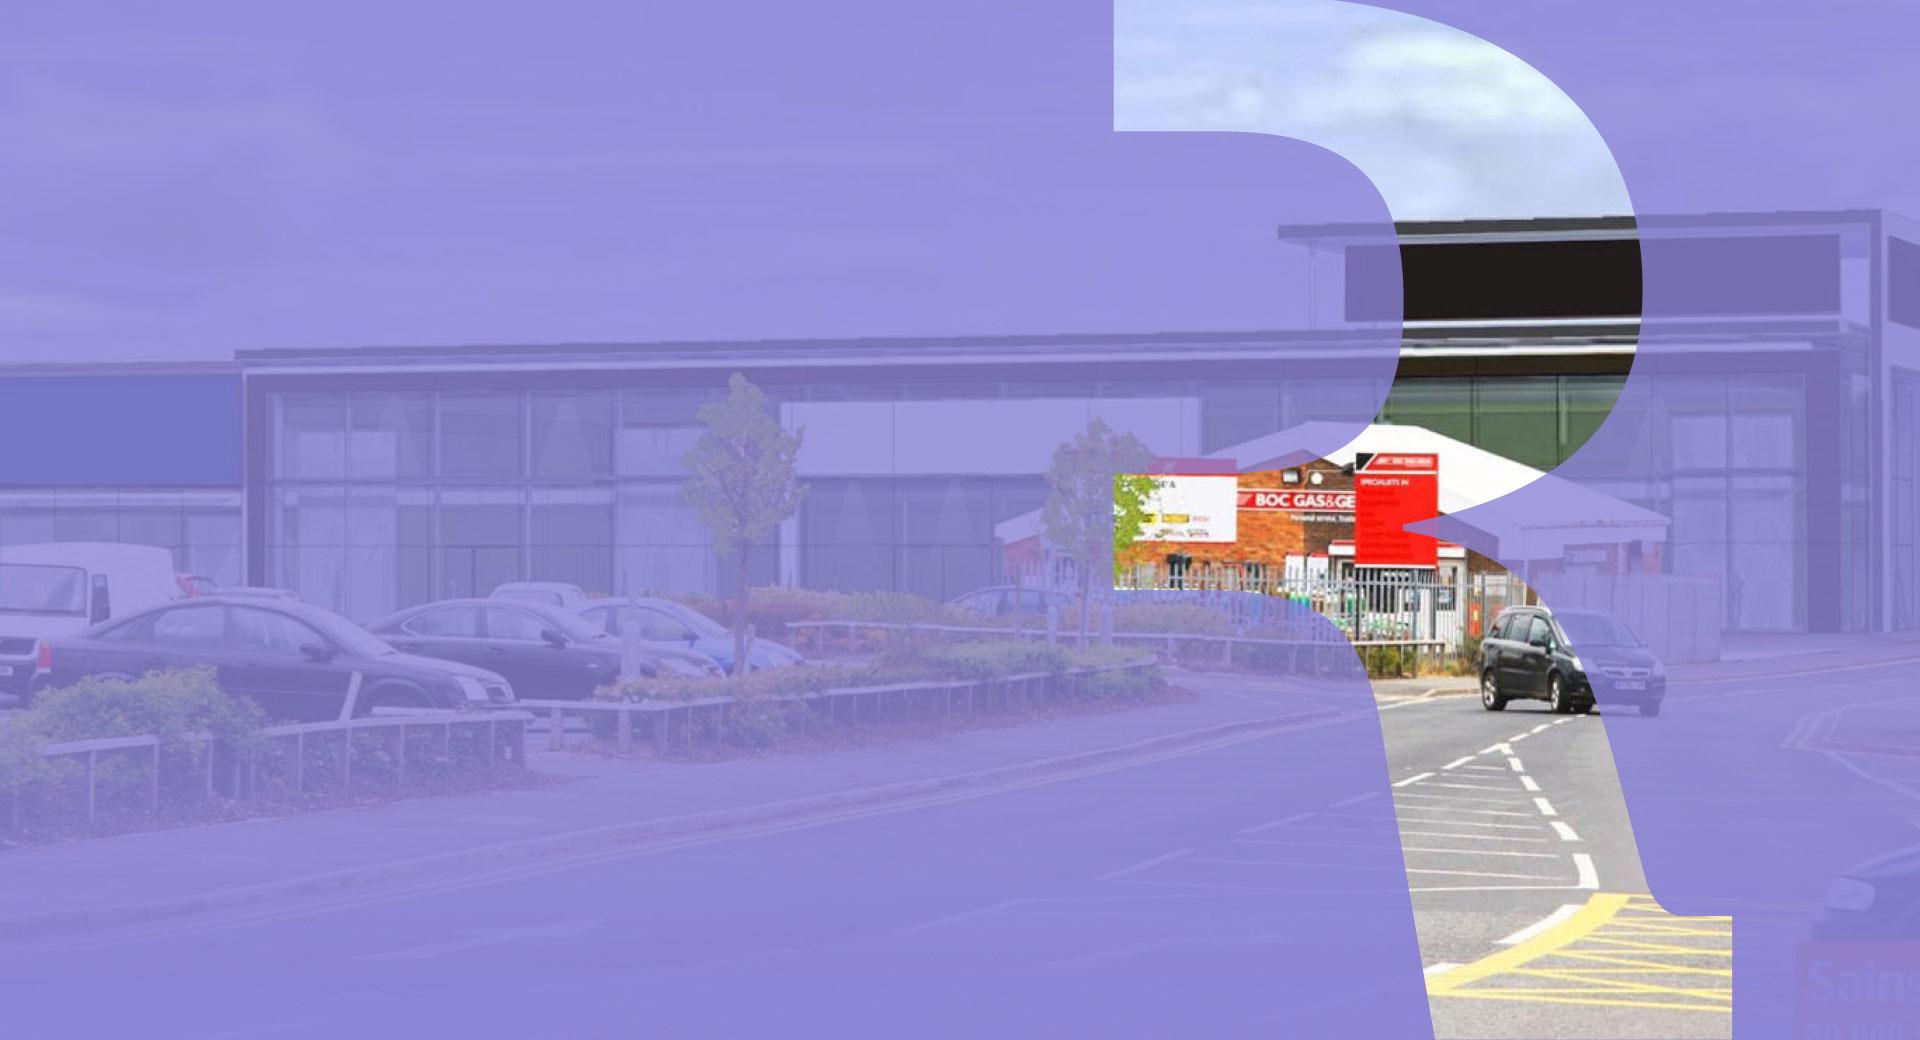 Roundhouse Retail Park